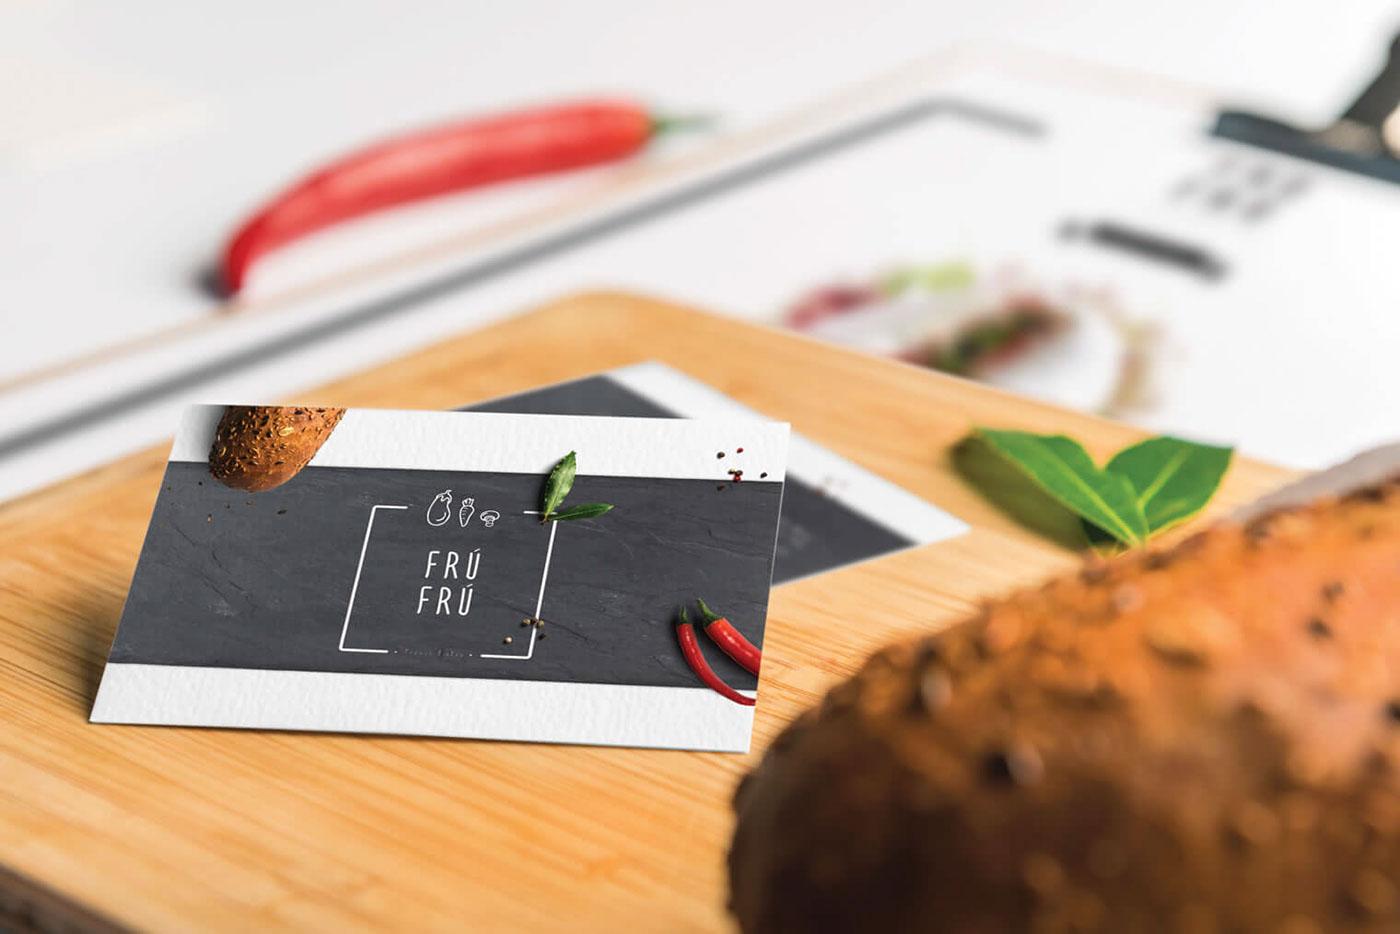 Food  italian French bistro restaurant cook gastronomy Web print fresh vegetables fru fru